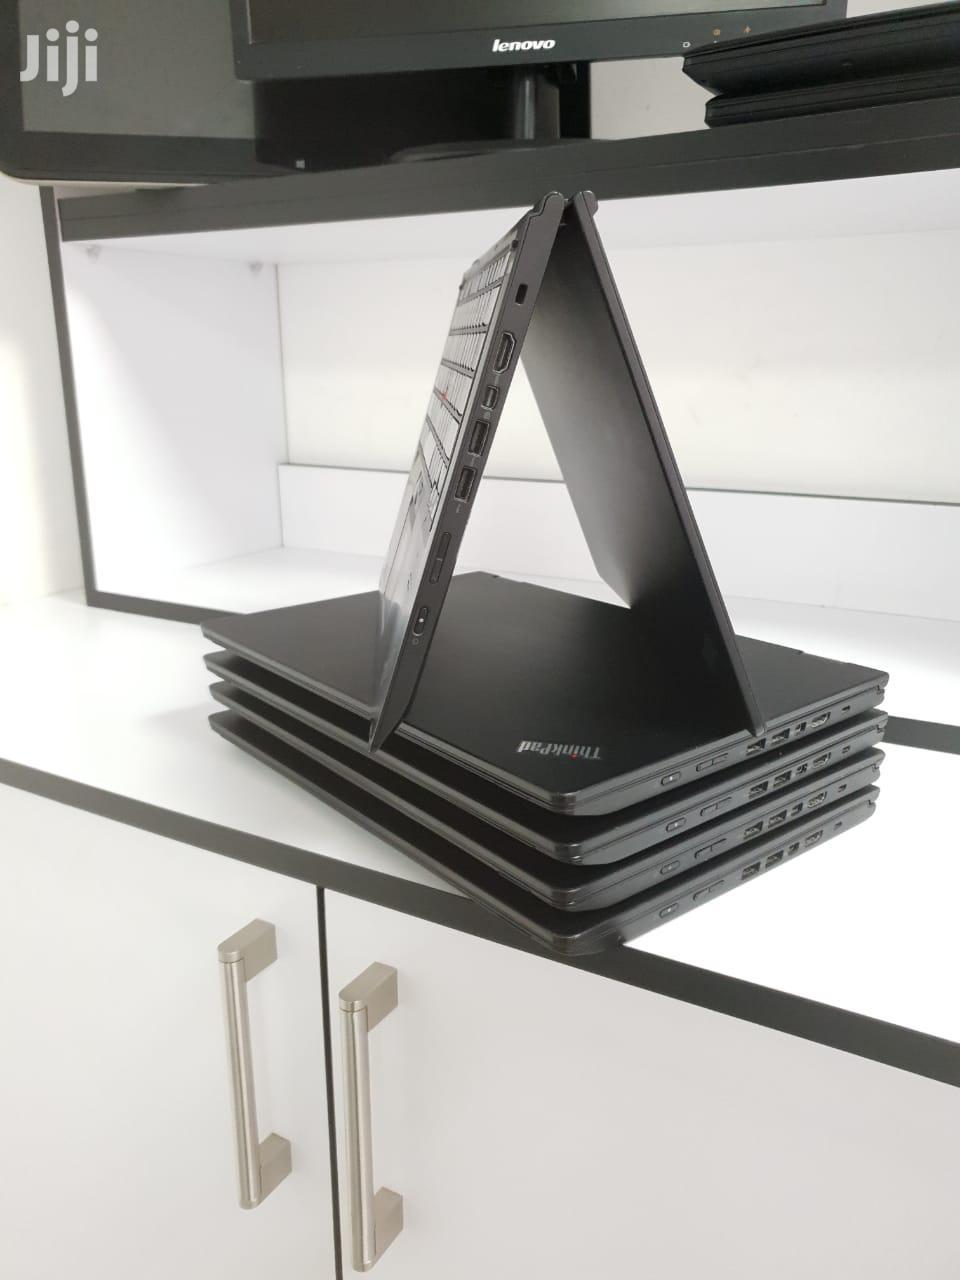 Laptop Lenovo ThinkPad Yoga 8GB Intel Core i5 SSD 256GB | Laptops & Computers for sale in Nairobi Central, Nairobi, Kenya